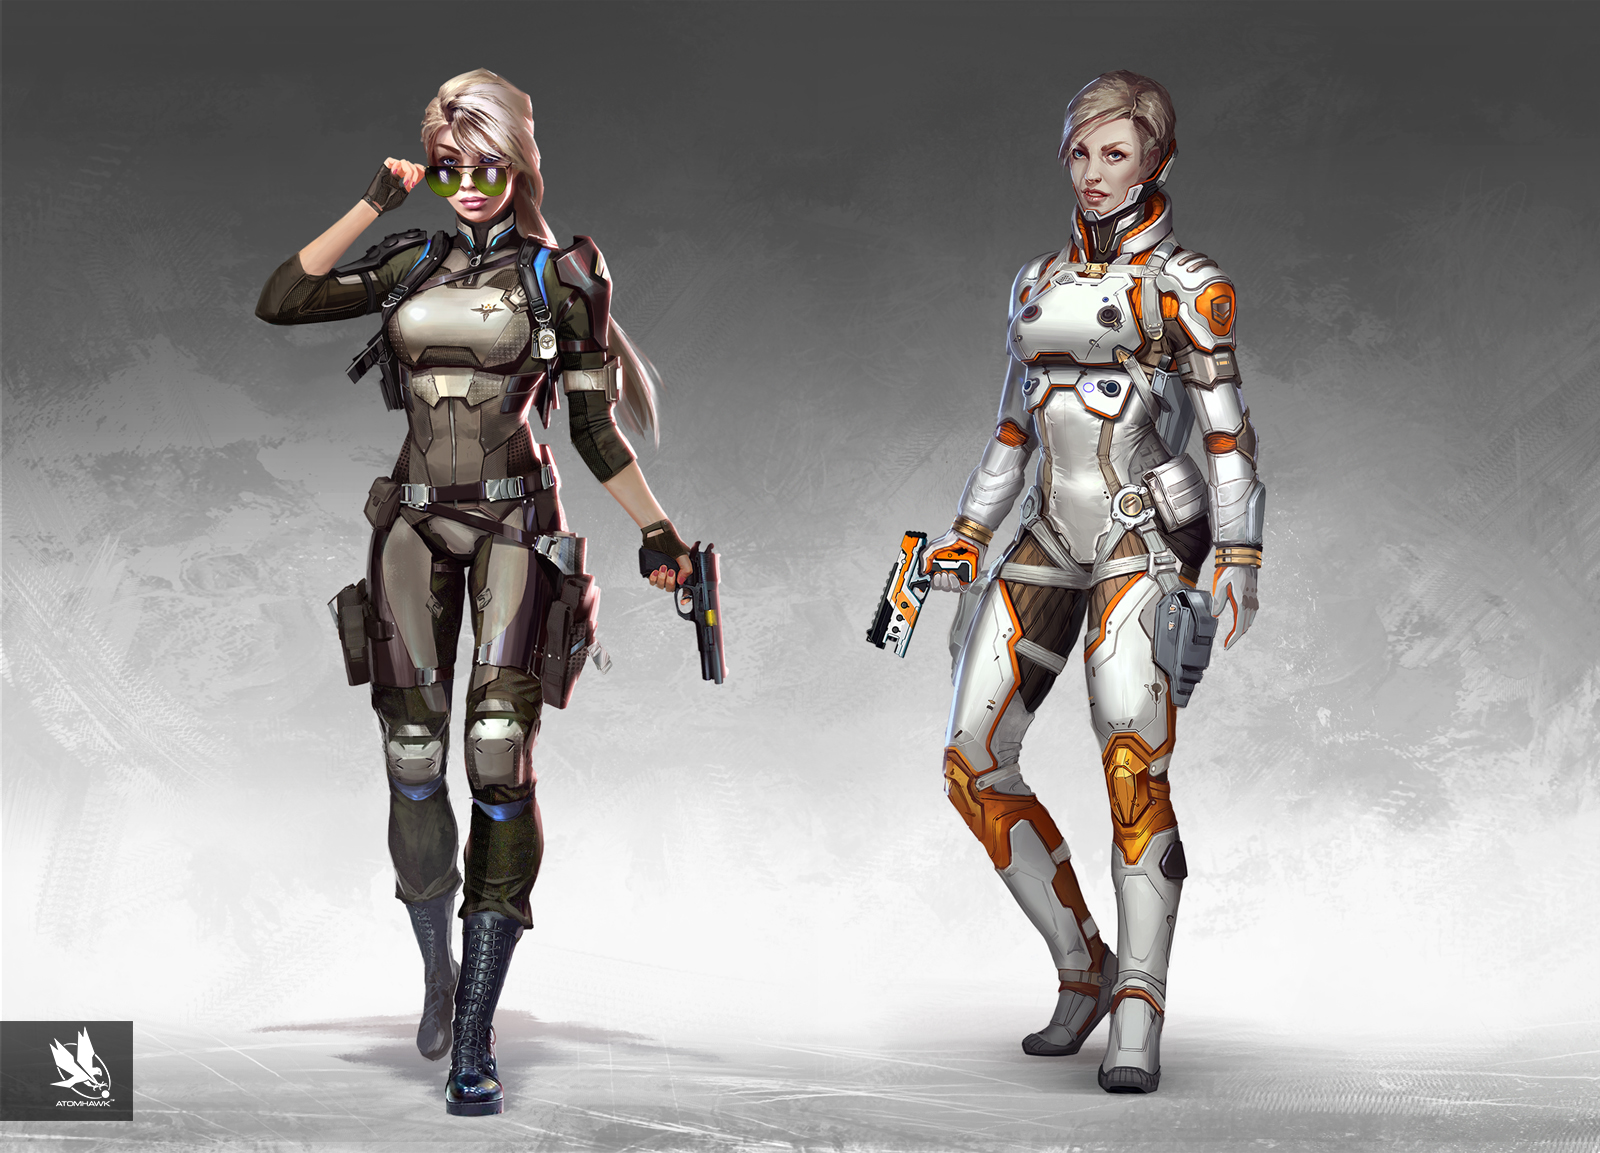 Atomhawk_Warner-Bros-NetherRealm_Mortal-Kombat-11_Concept-Art_Character-Design_Side-by-Side_Cassie-Cage.jpg